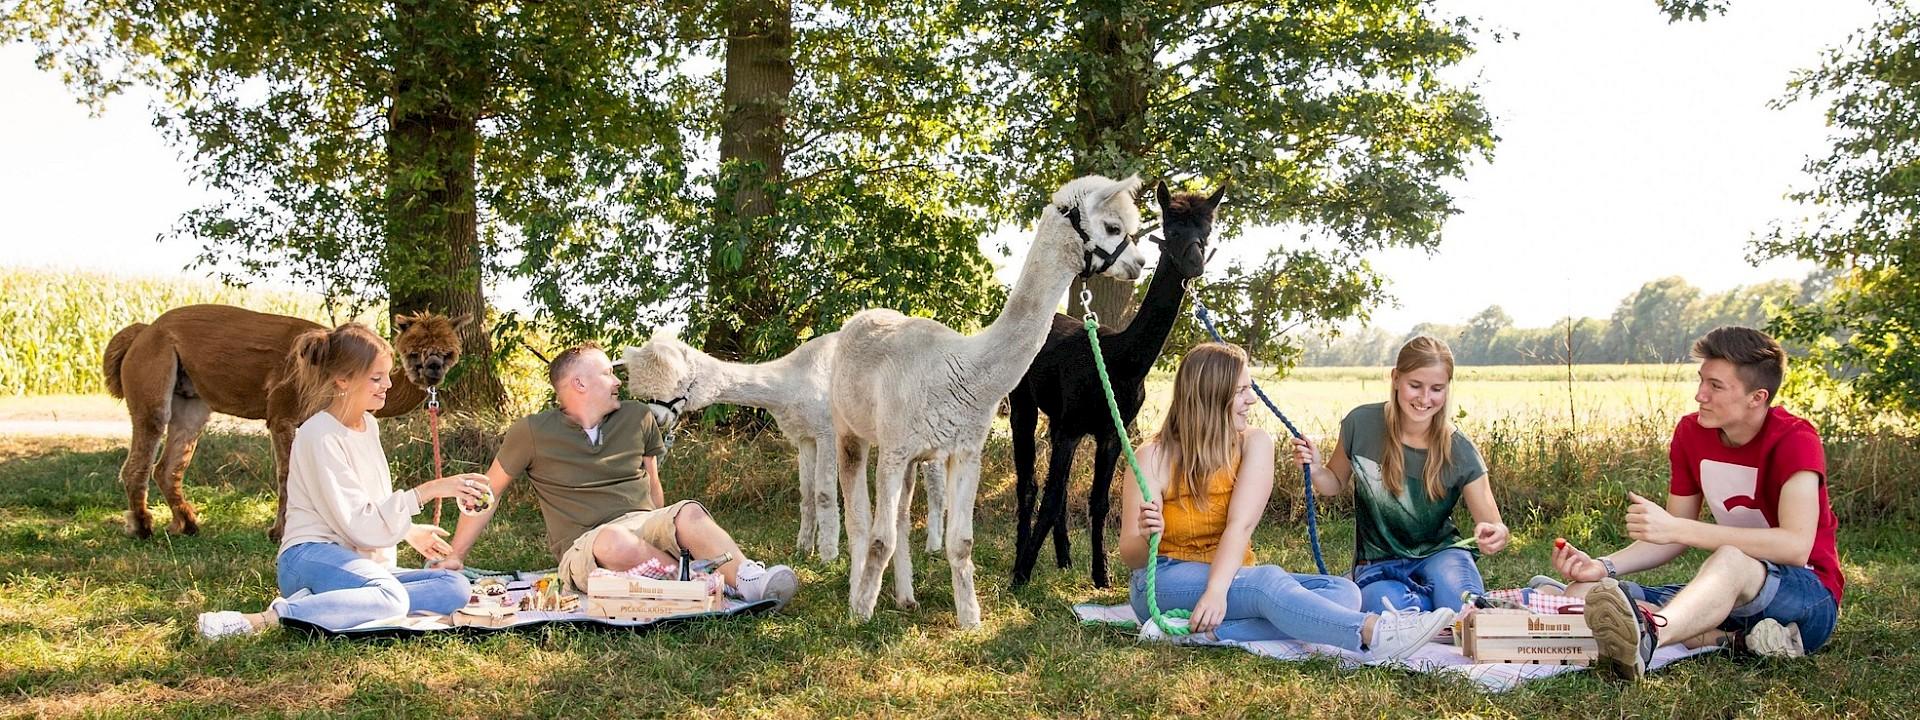 Entfliehe dem Alltagsstress Alpaka-Picknick in Gronau